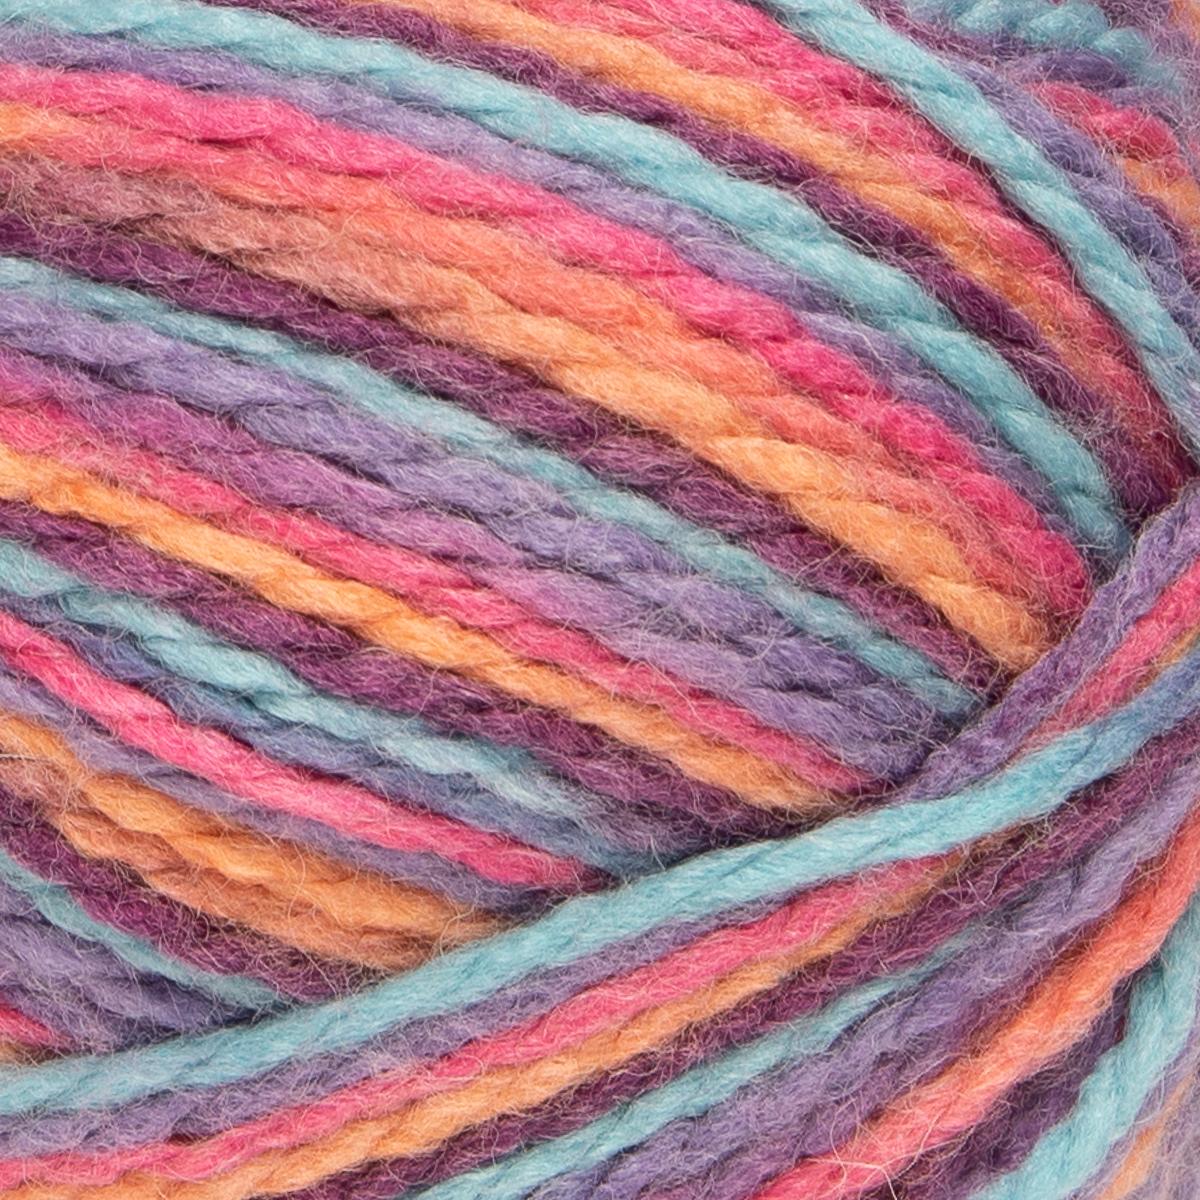 3pk-Lion-Brand-Color-Waves-Acrylic-amp-Wool-Yarn-Light-3-Soft-Knitting-Crocheting thumbnail 31